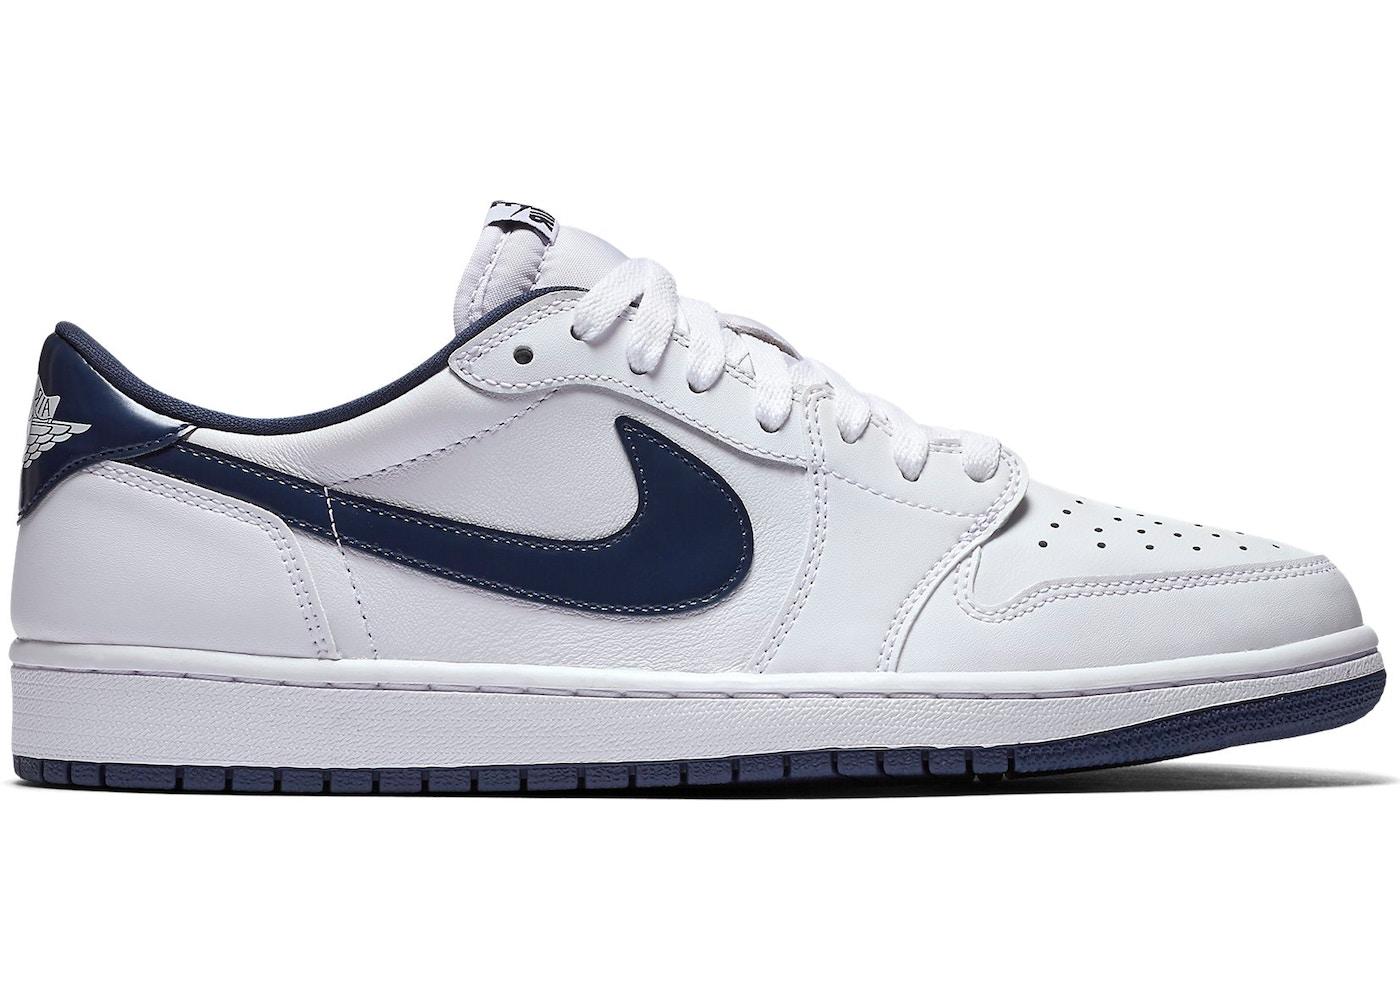 e66fcf9a7ec Air Jordan 1 Size 10 Shoes - Volatility